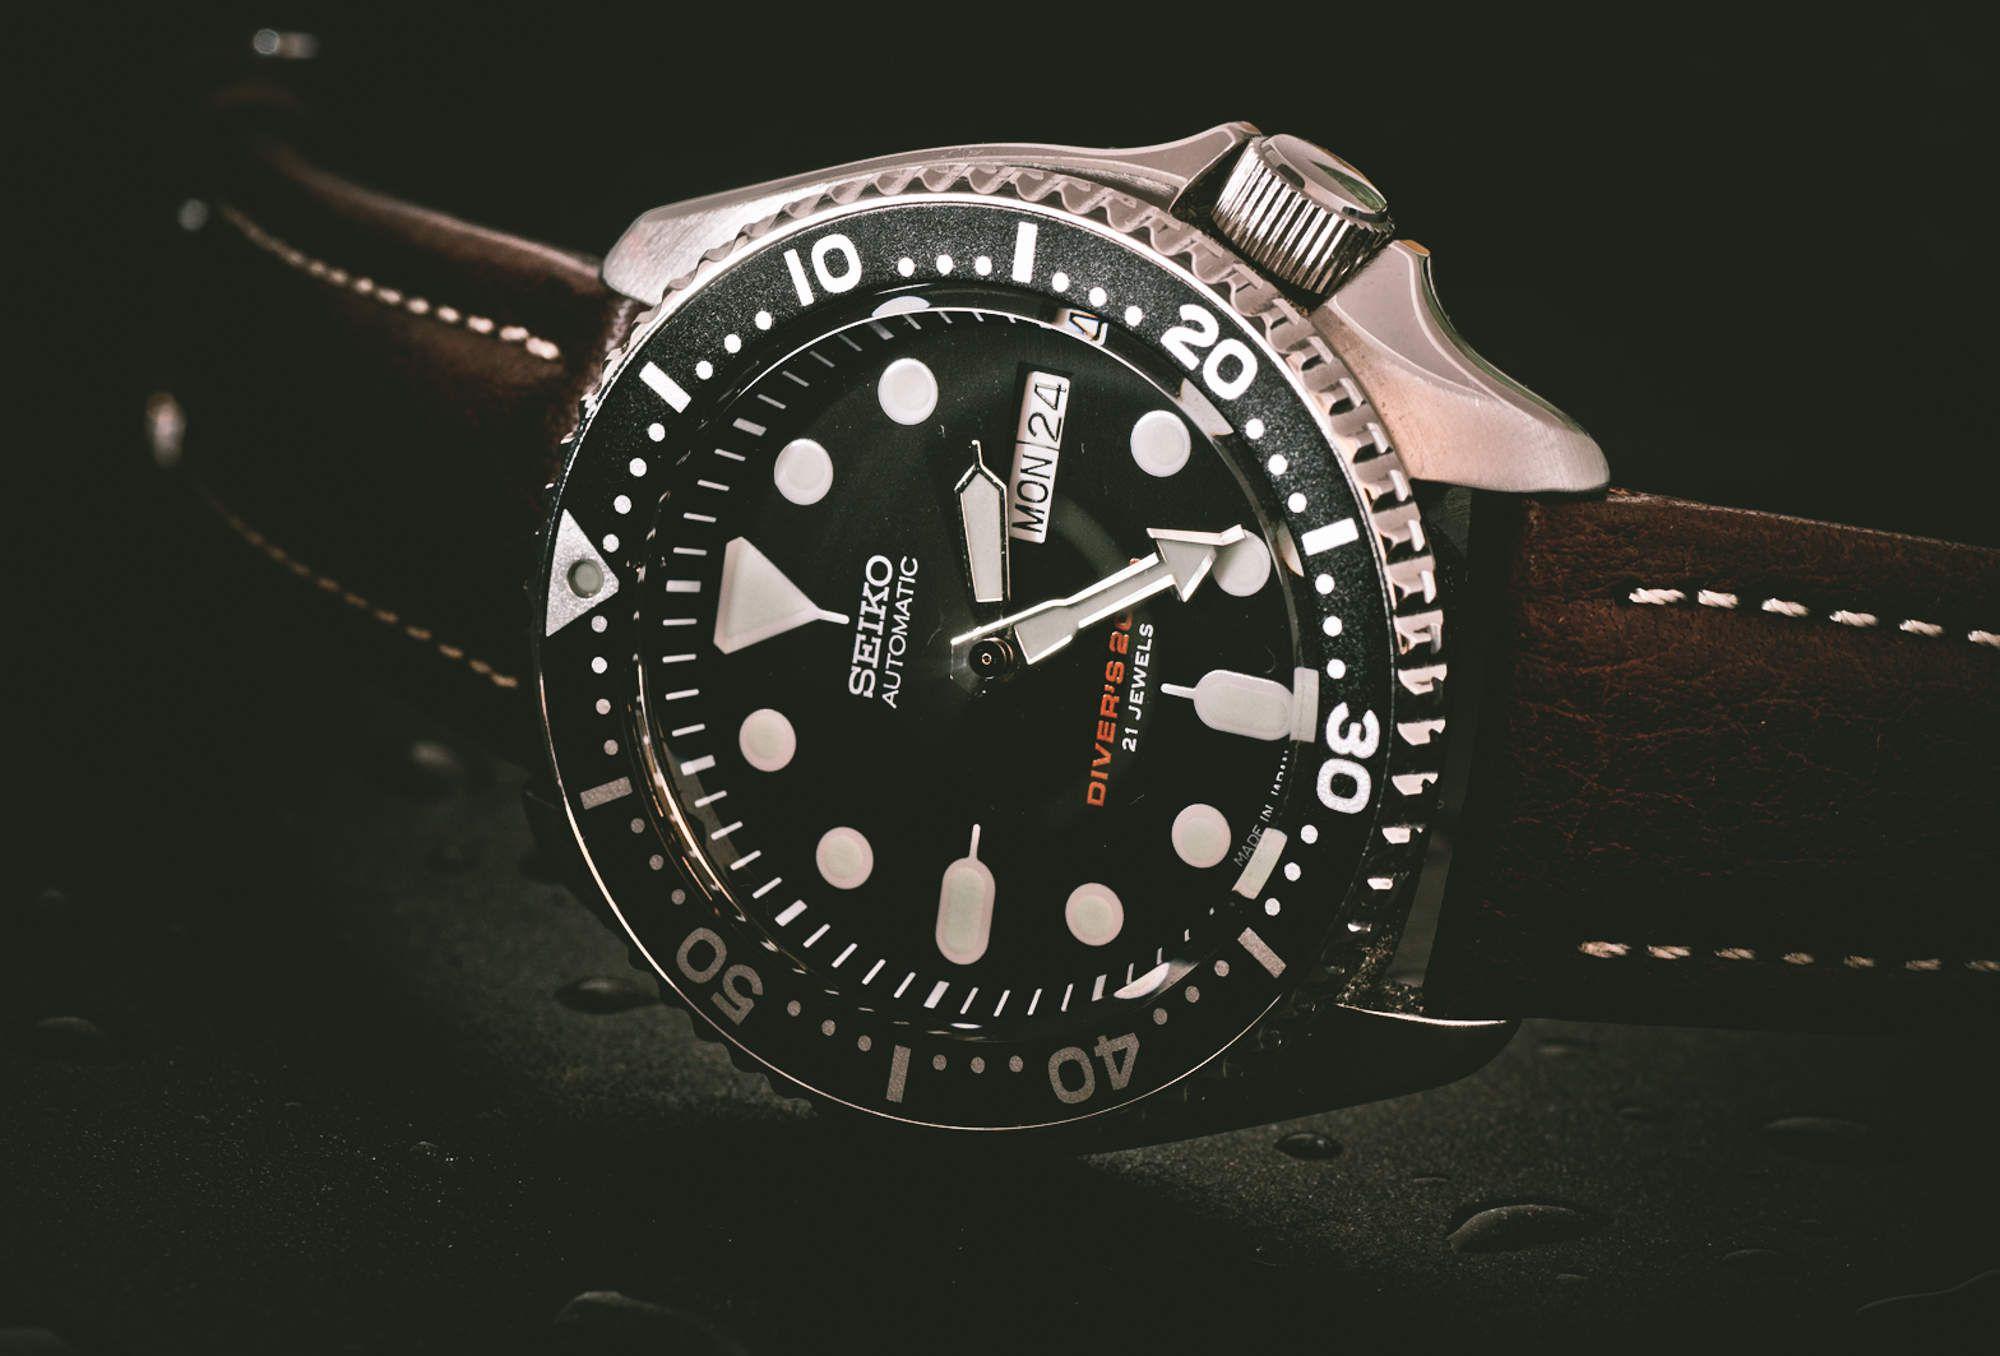 SUPERCOMPRESSOR: Seiko 7S26 vs. Rolex Submariner  http